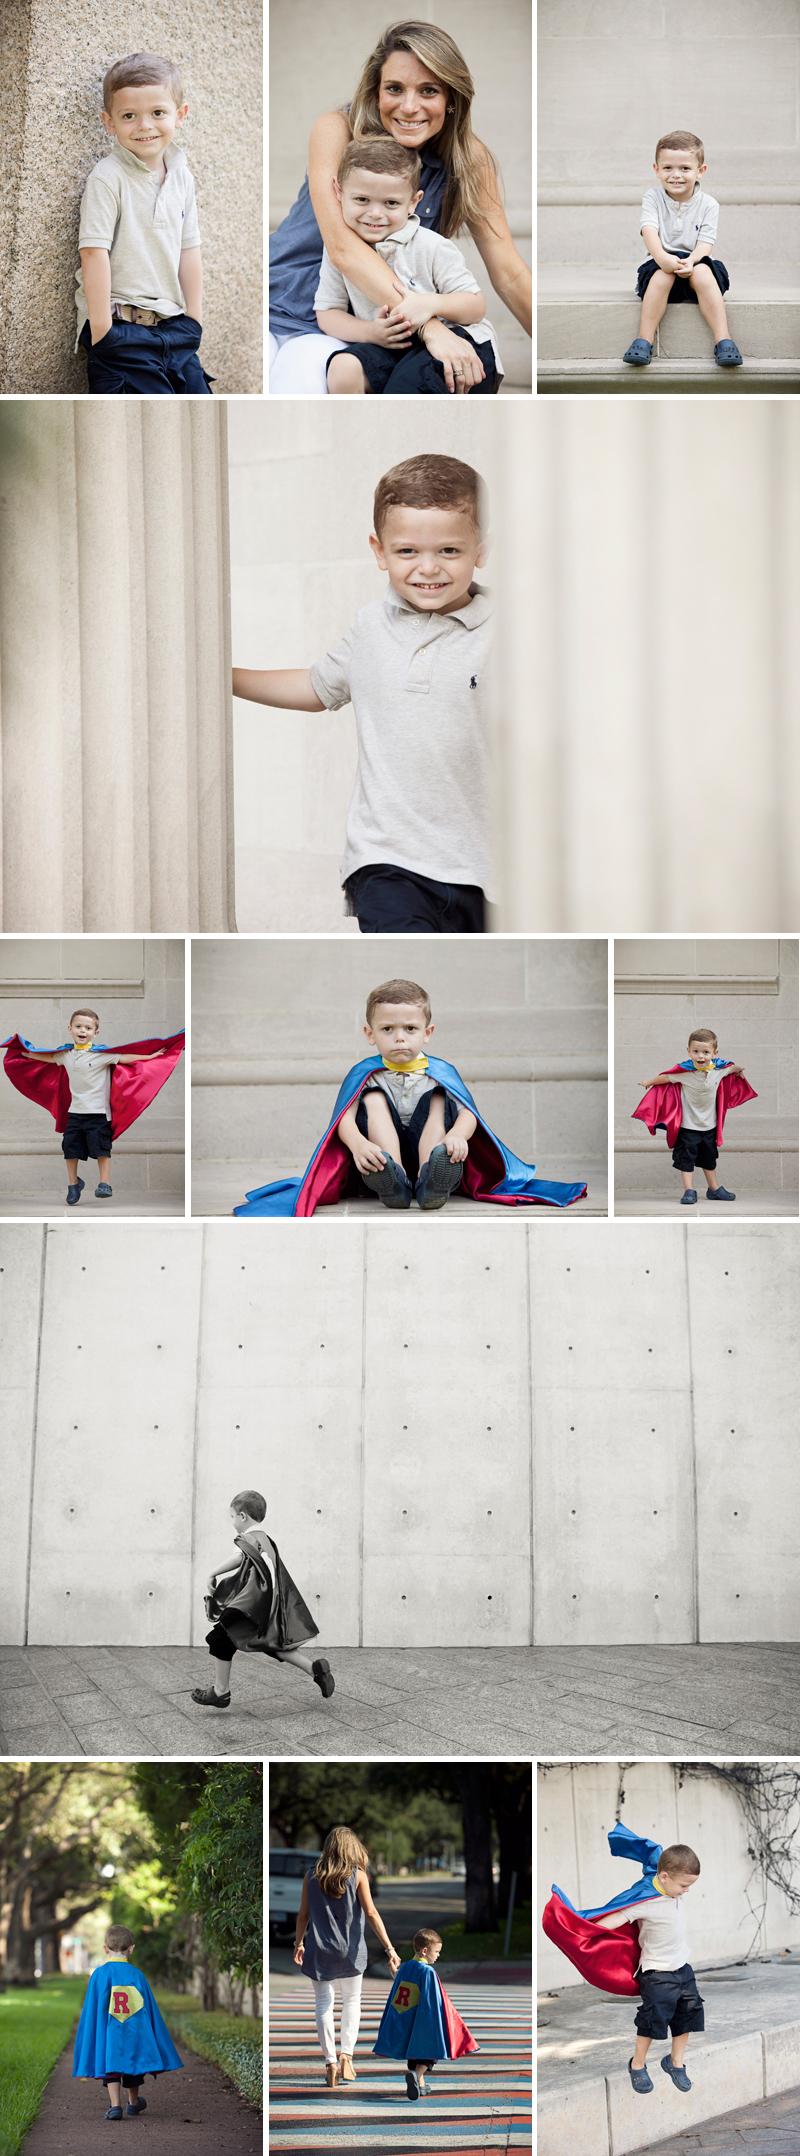 houston childrens photographer kelley R4 storyboard